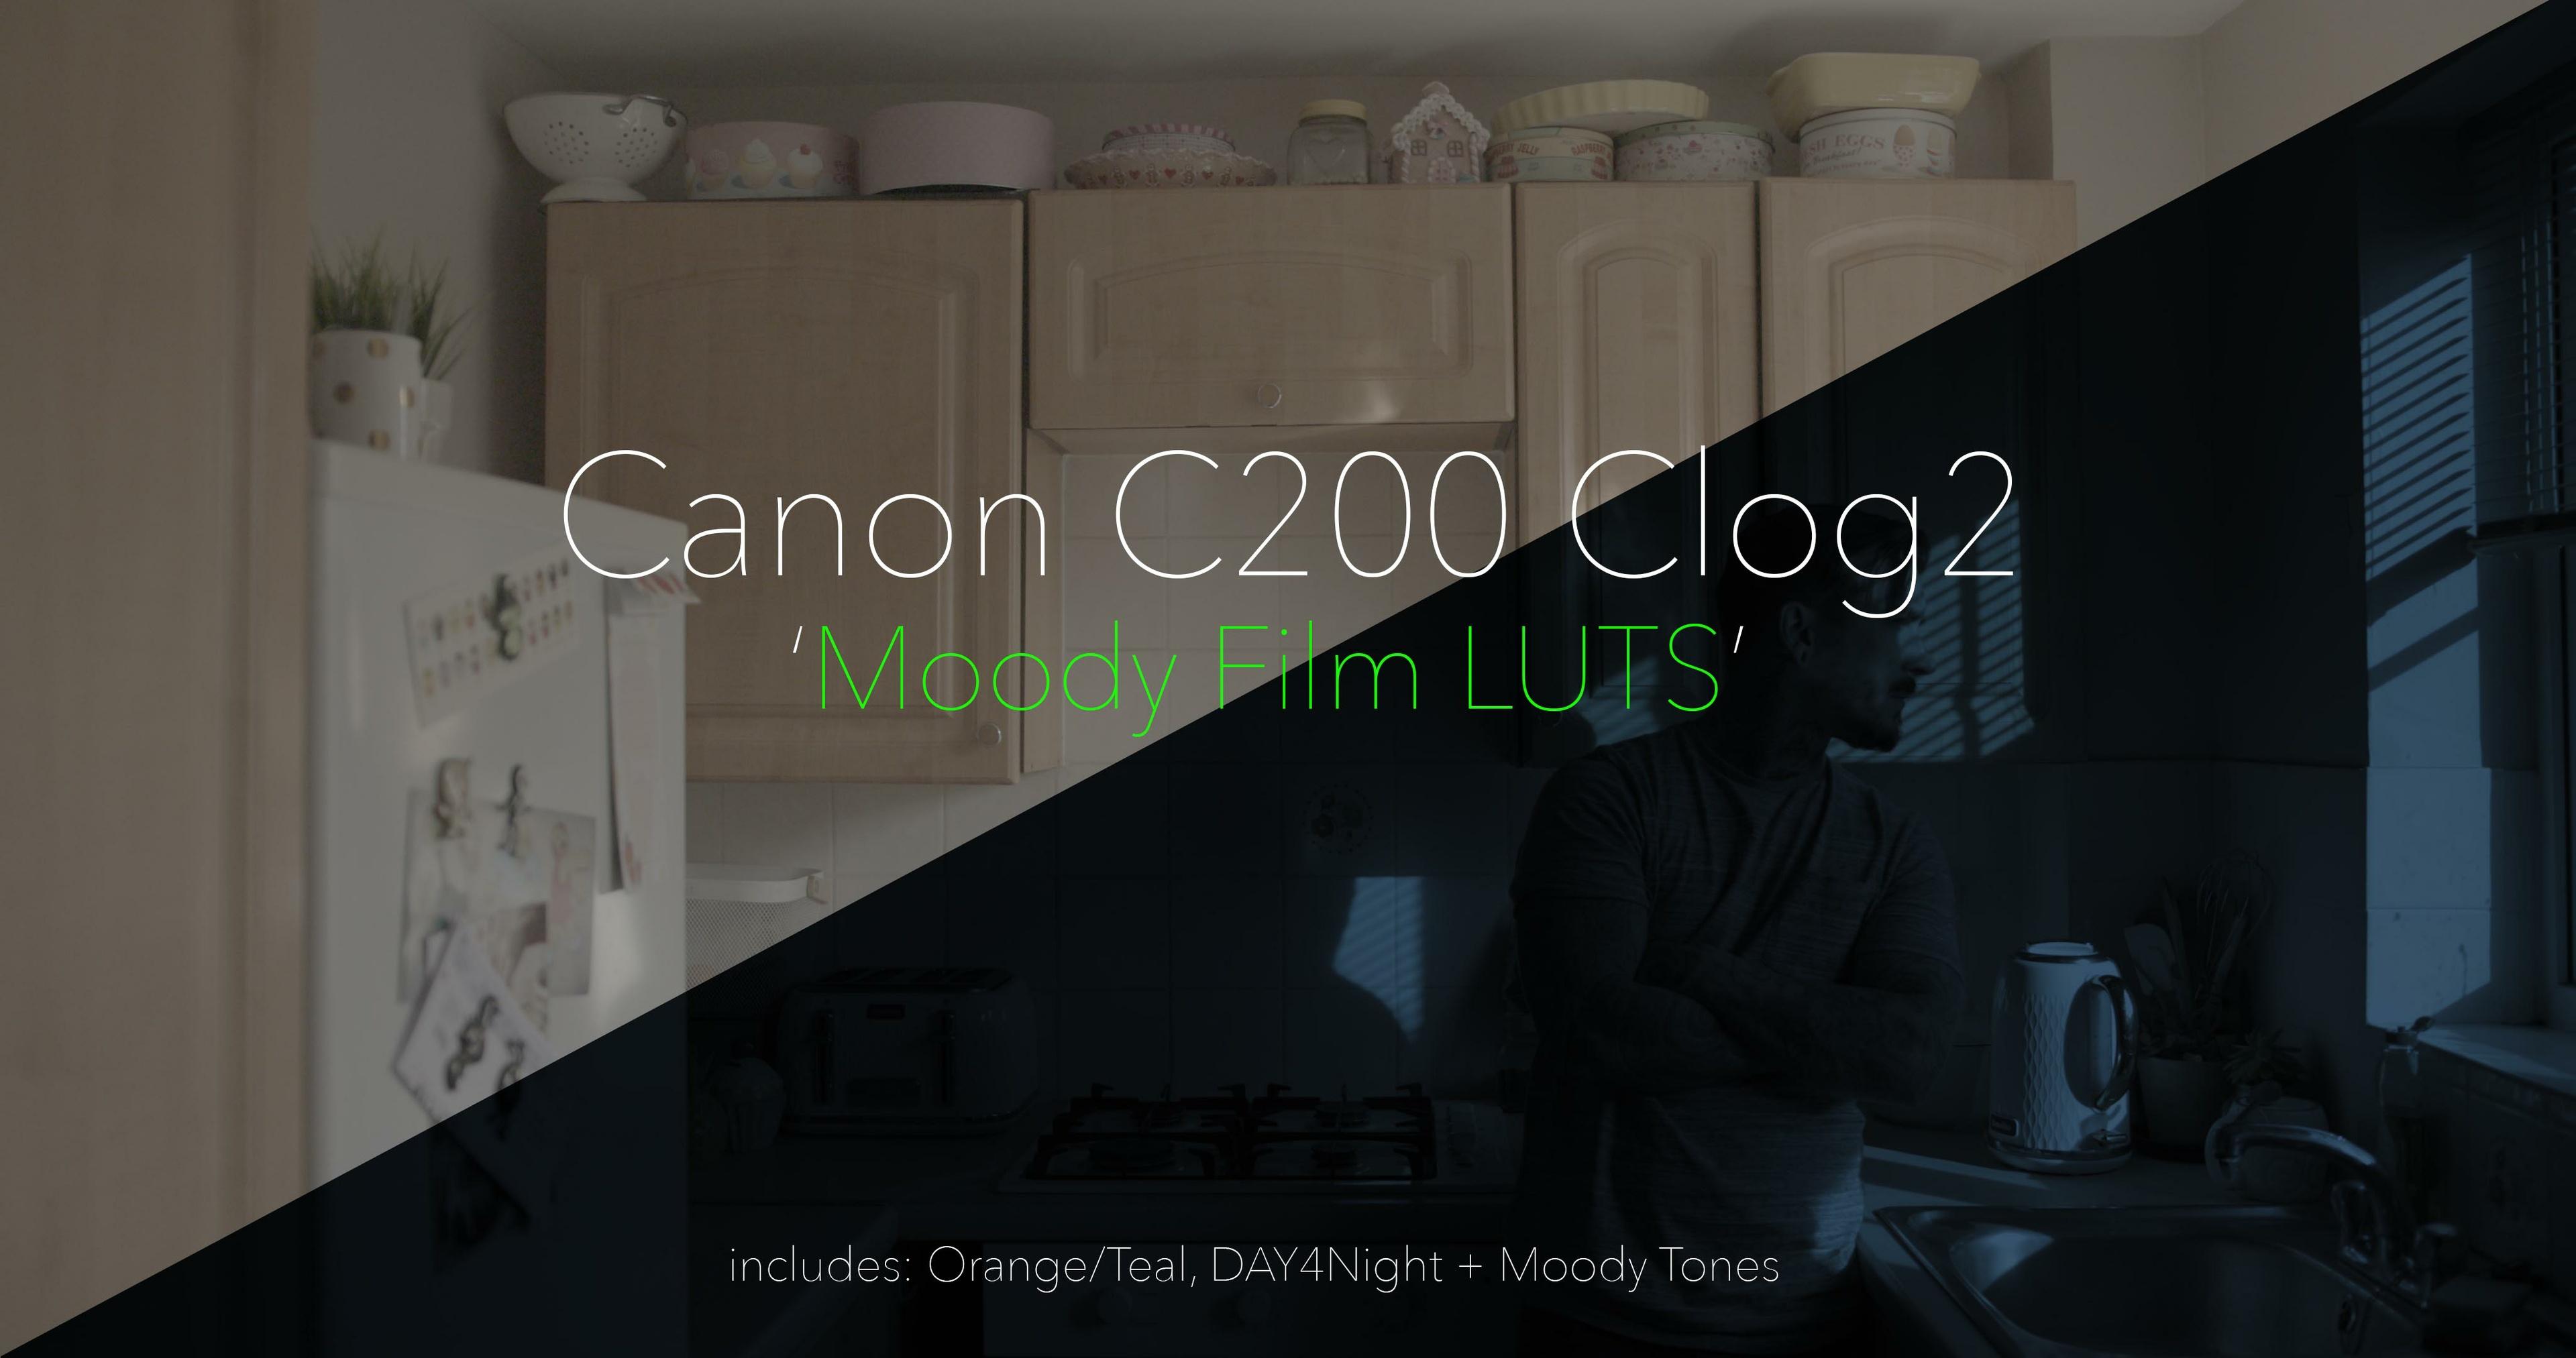 Canon C200 C-Log2 // Moody Film LUTS